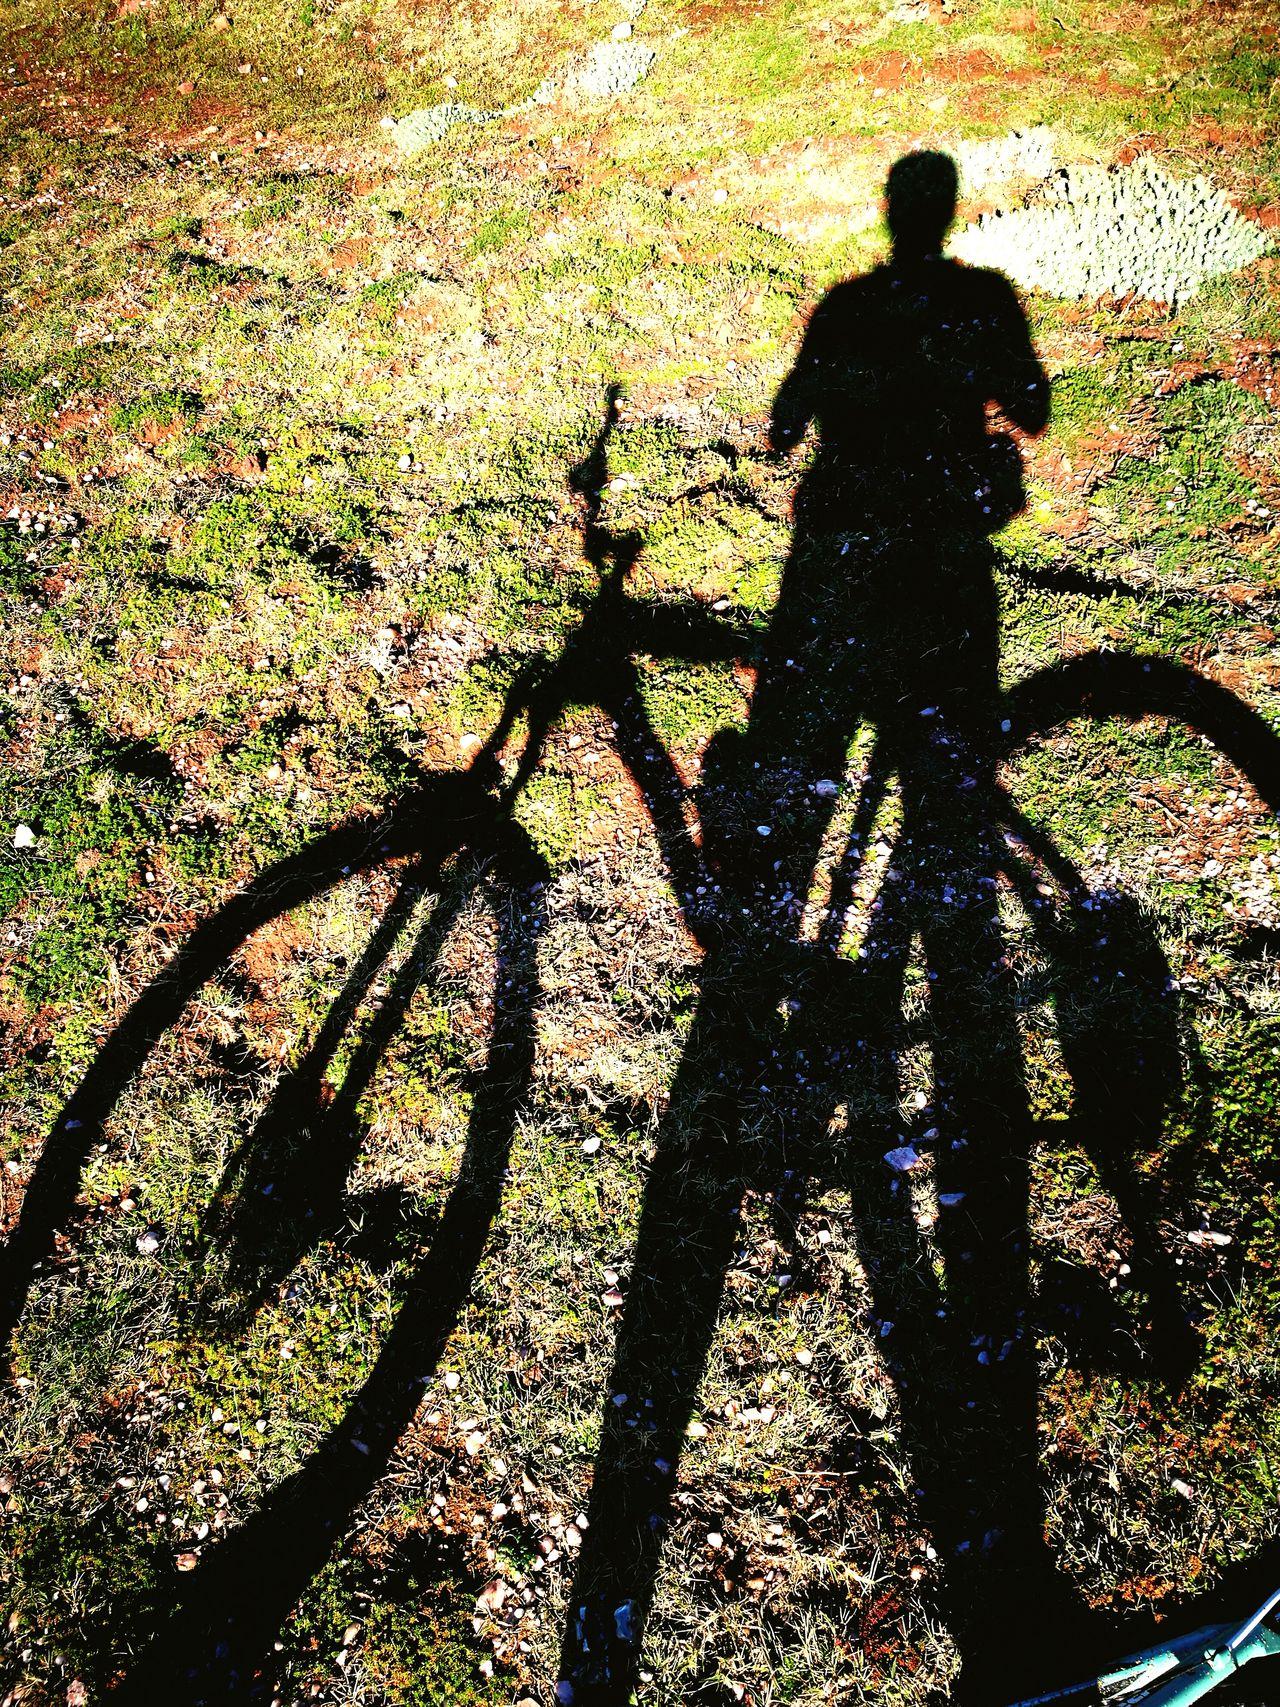 My Year My View Biketour Freedoom  Nature Makes Me Smile Ride My Bike Sightseeing Tour December Lights Sun Day ☀ Shadow Sea Rocks